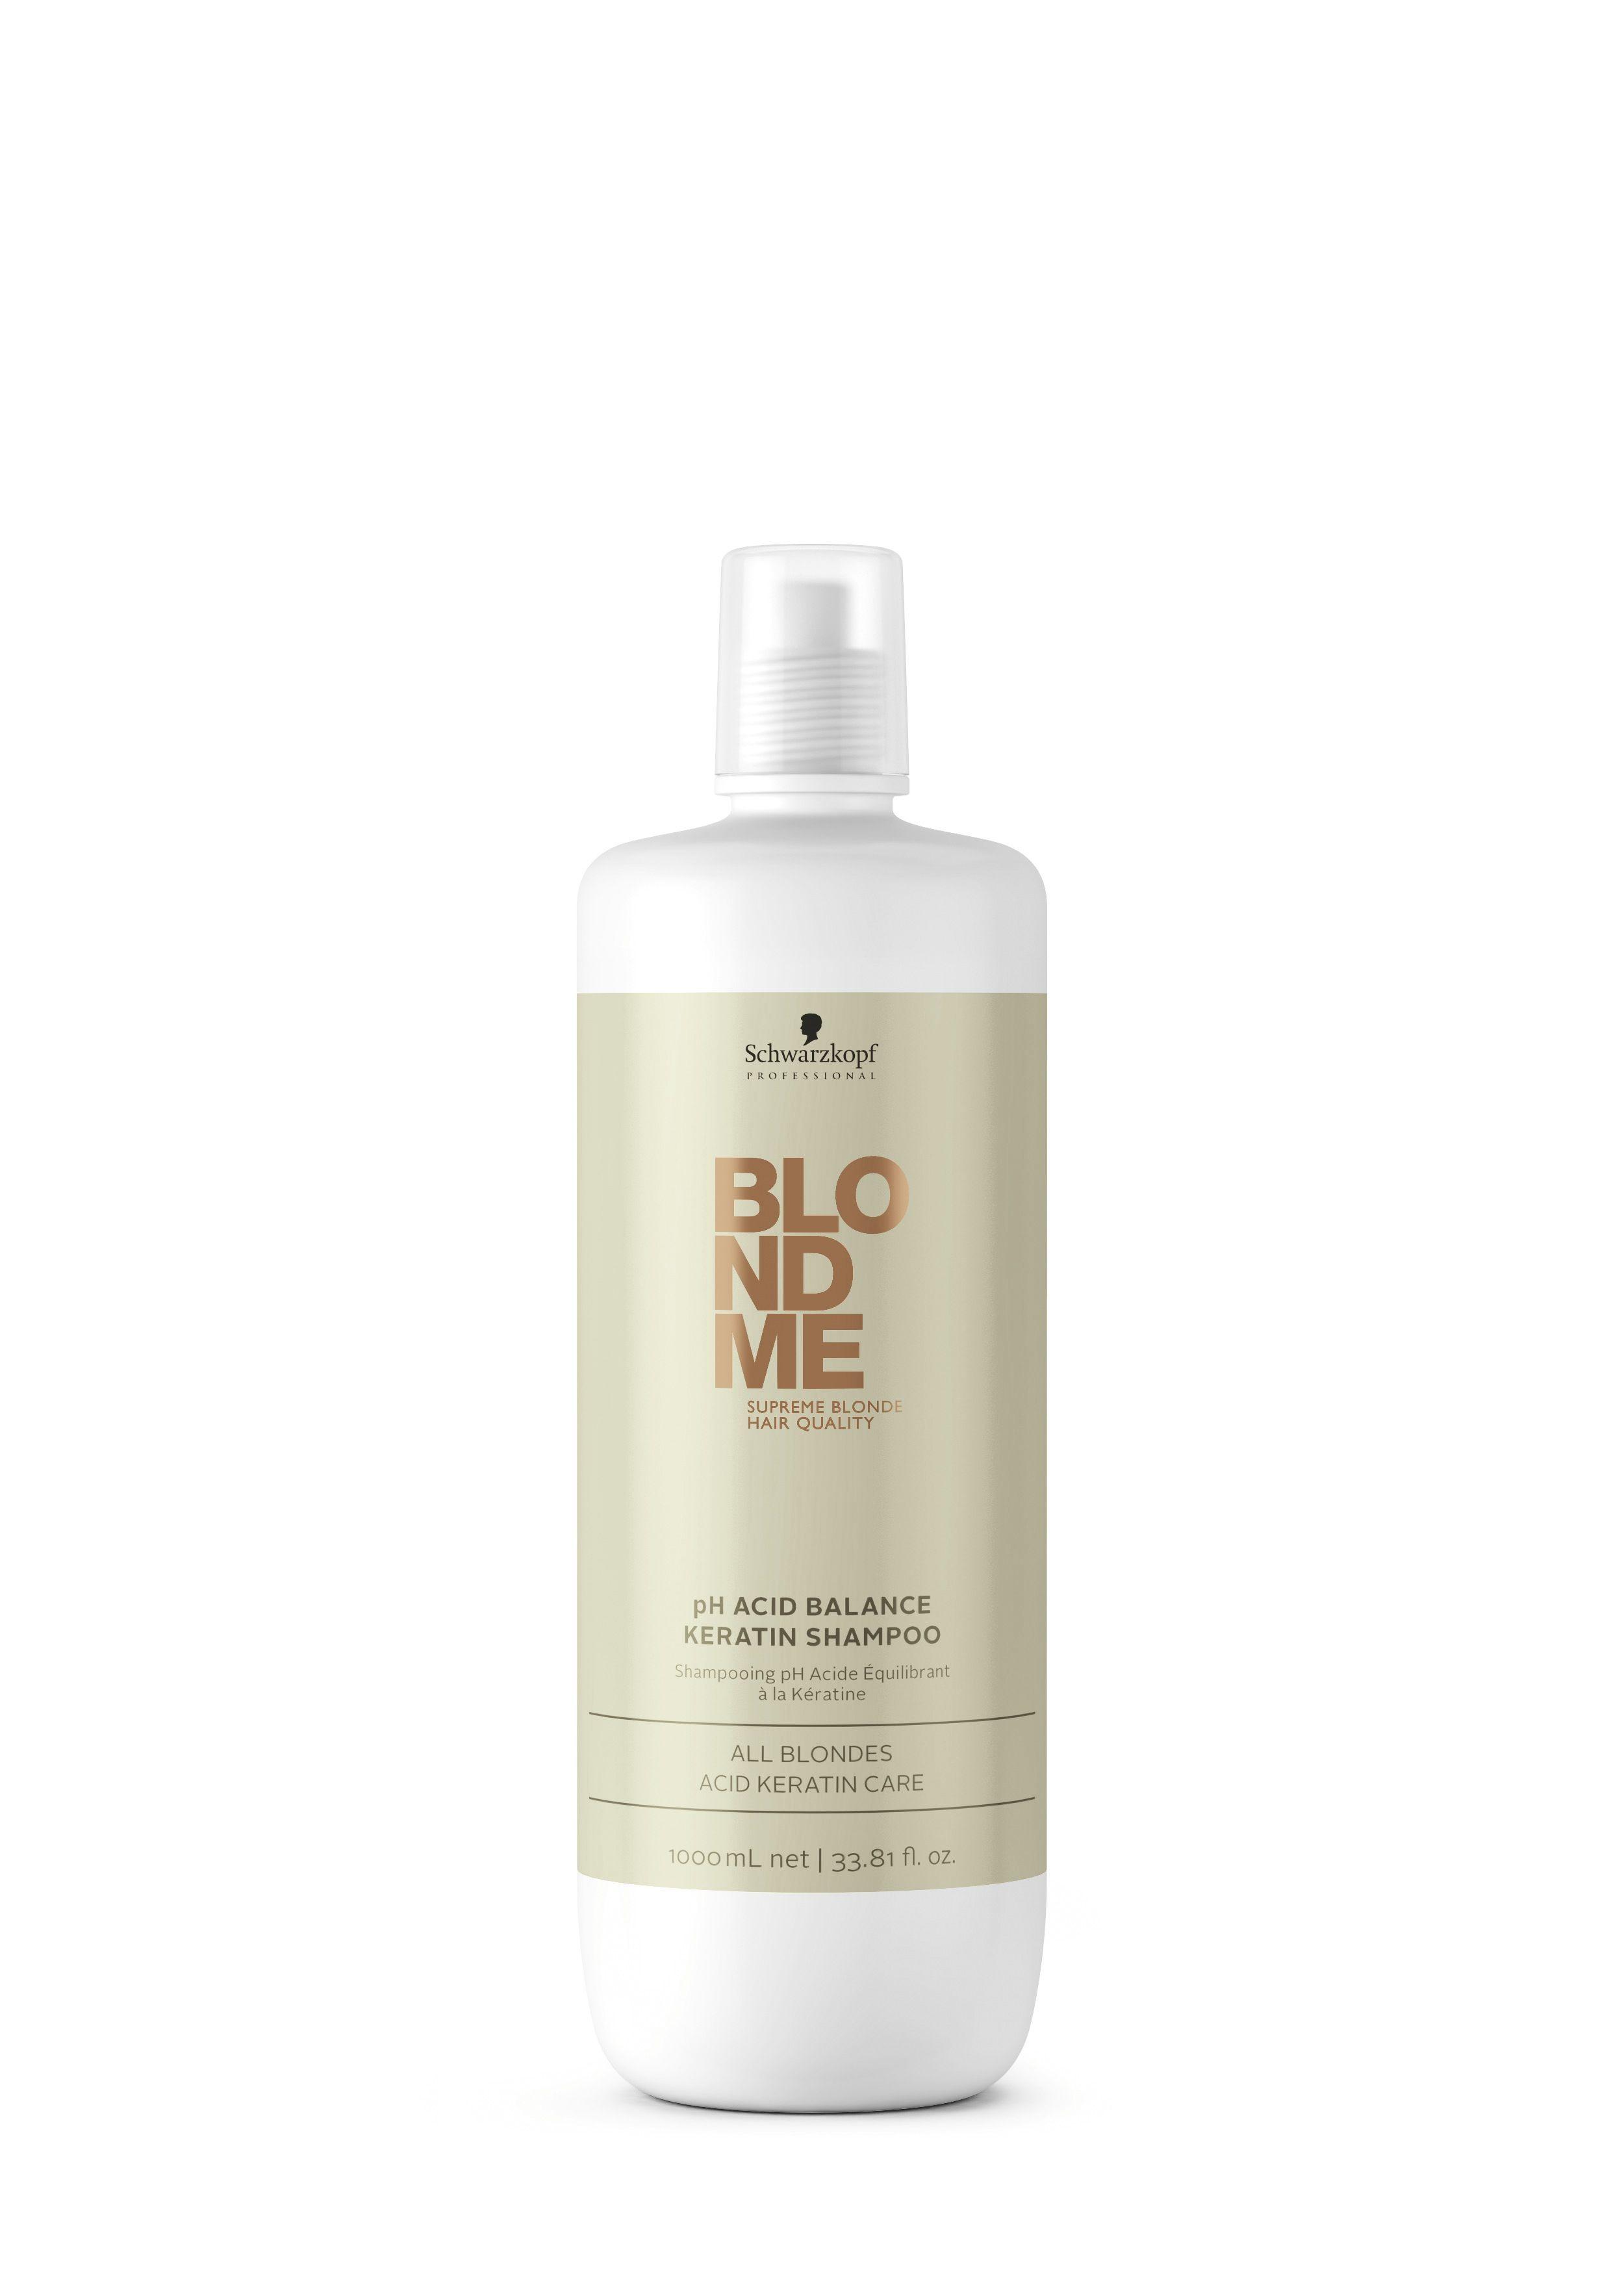 Schwarzkopf Professional Blond Me pH Acid Balance Keratin Shampoo